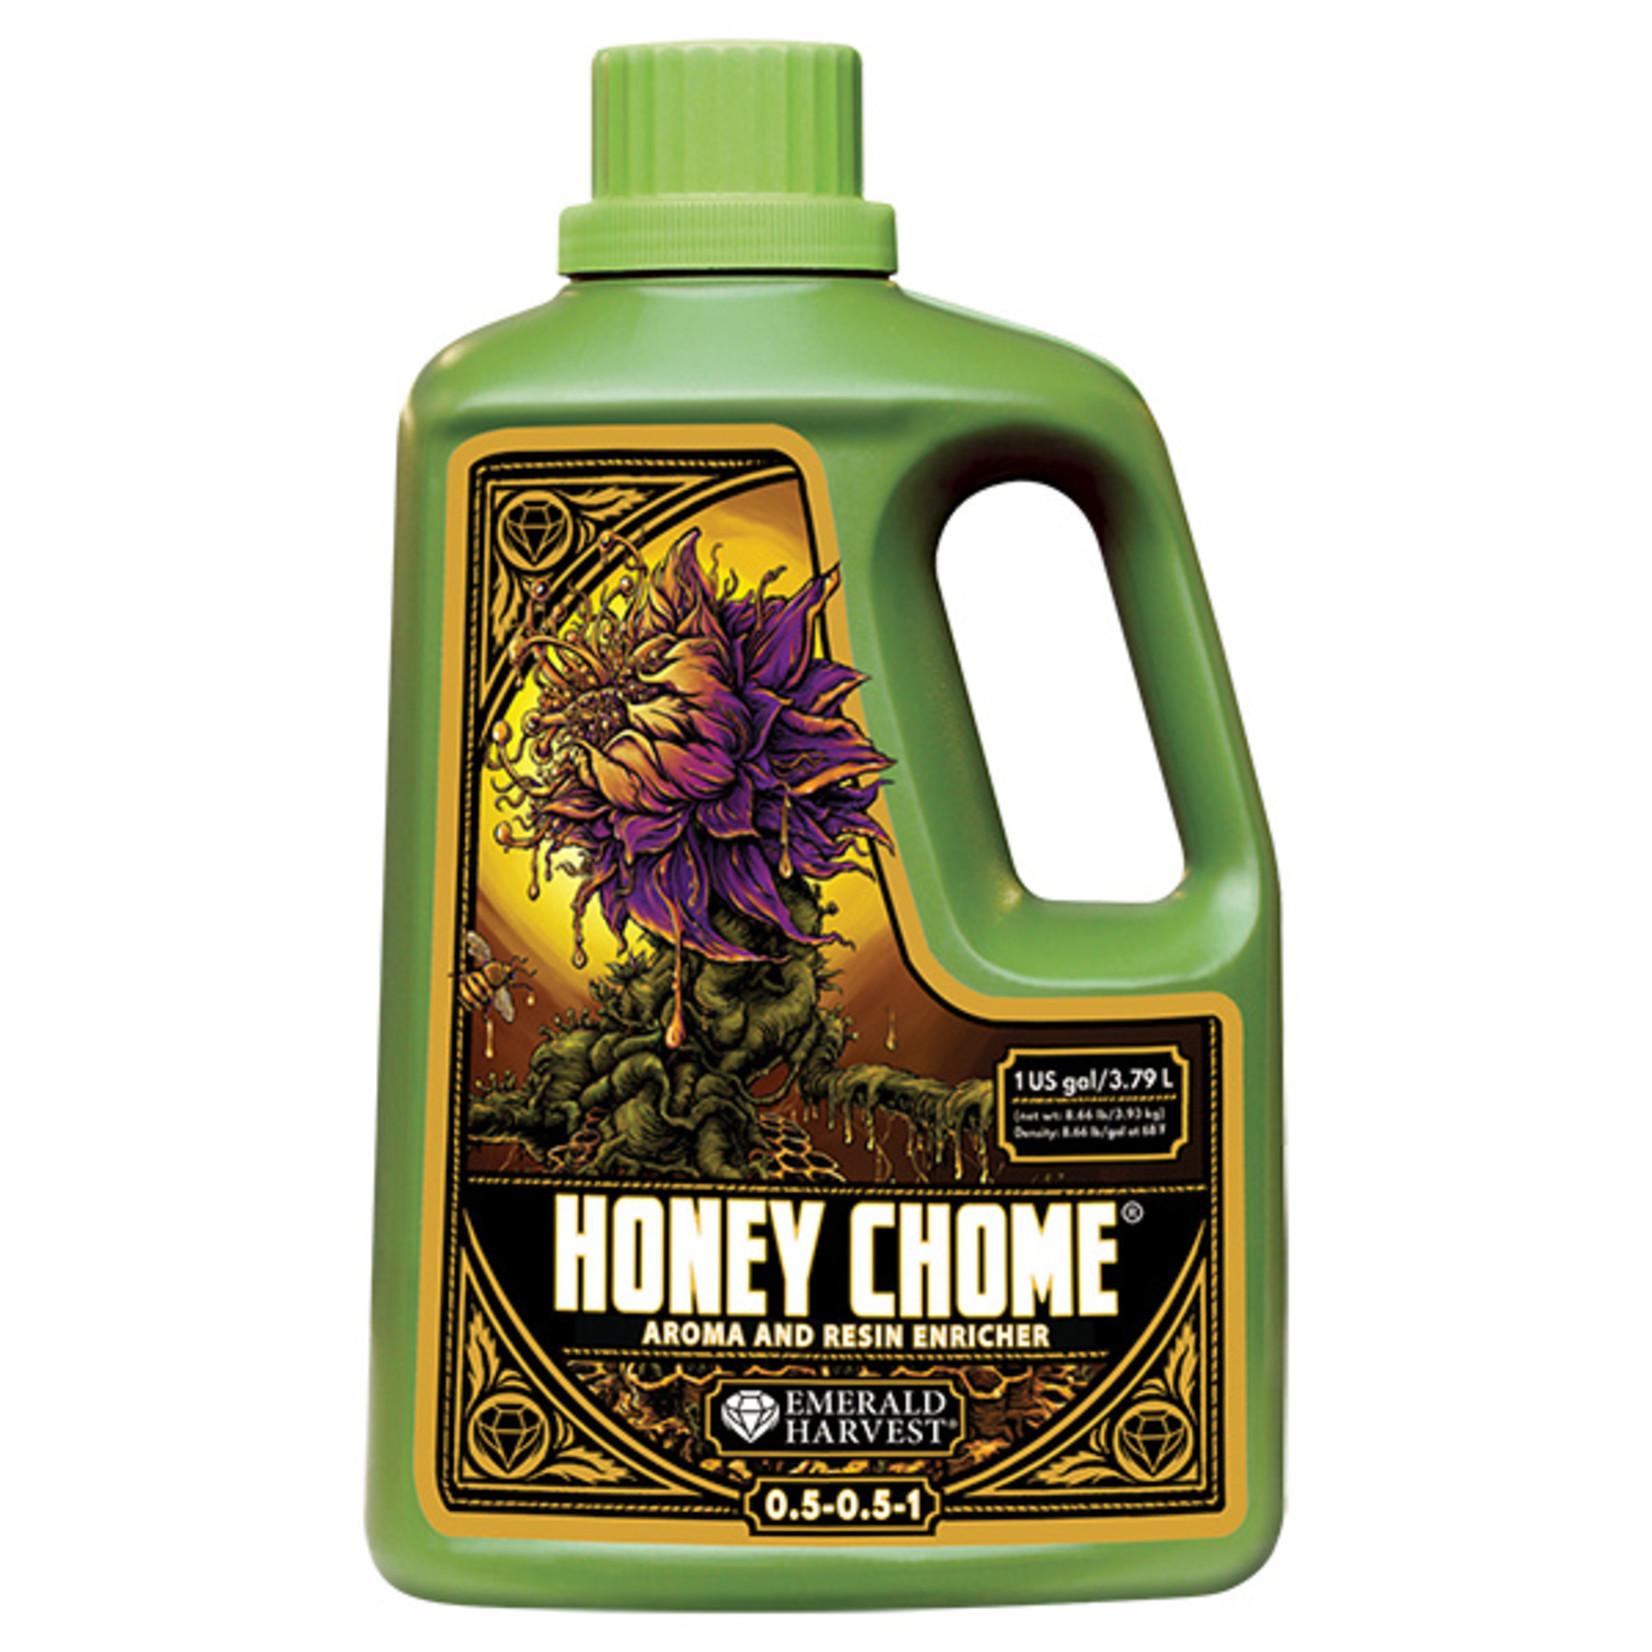 Emeral Harvest Emerald Harvest Honey Chome Quart/0.95 Liter